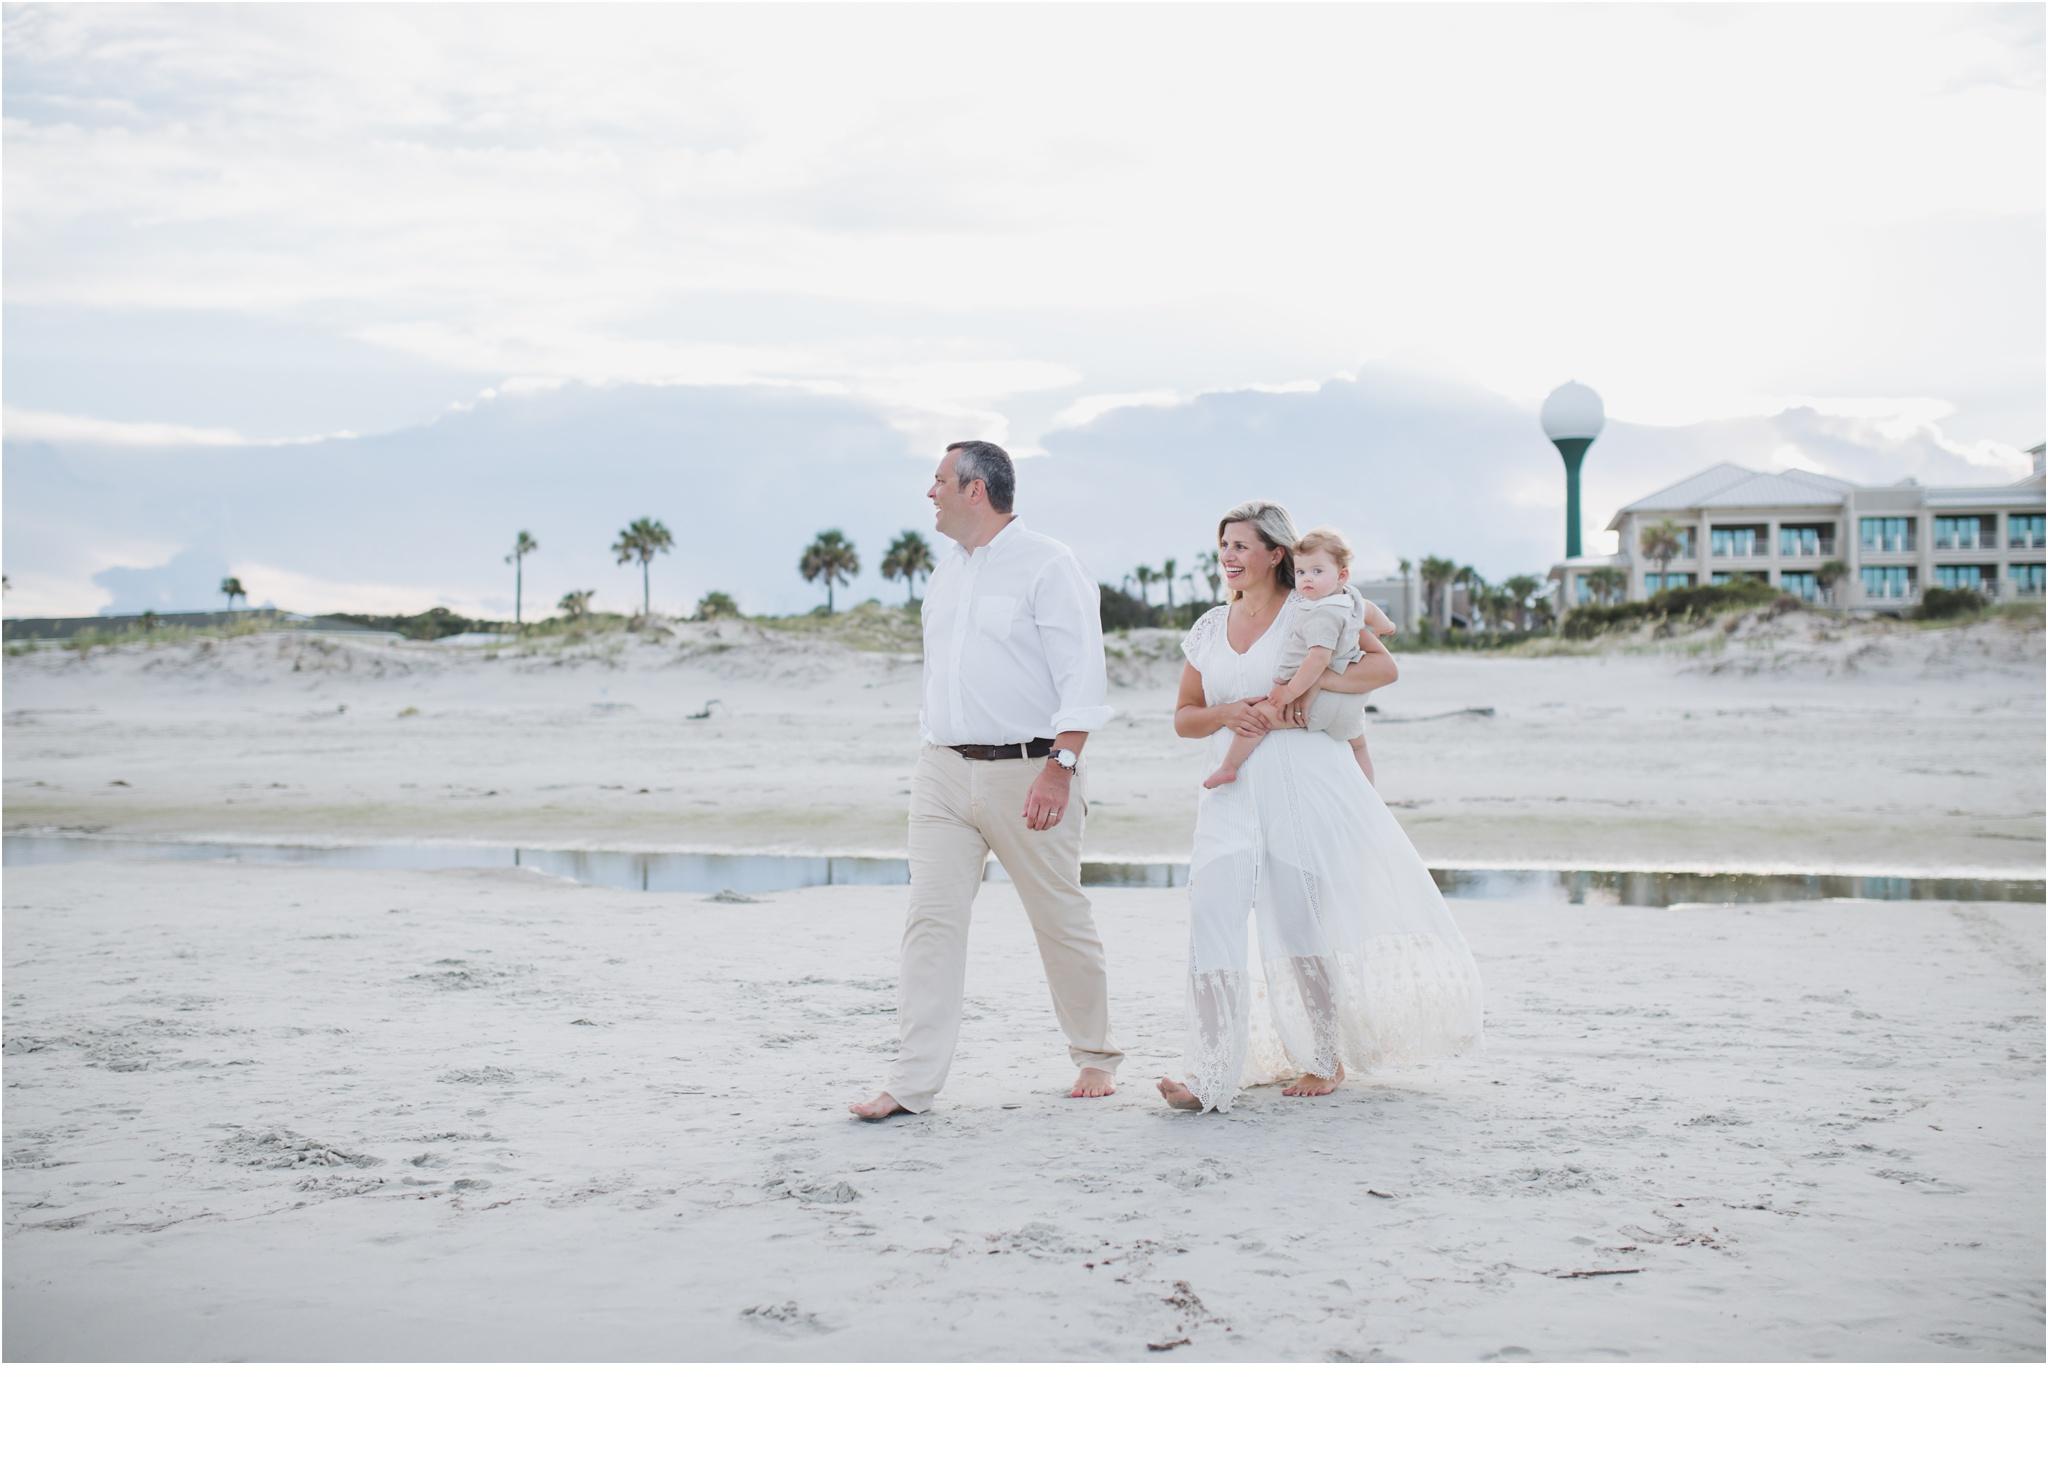 Rainey_Gregg_Photography_St._Simons_Island_Georgia_California_Wedding_Portrait_Photography_1029.jpg